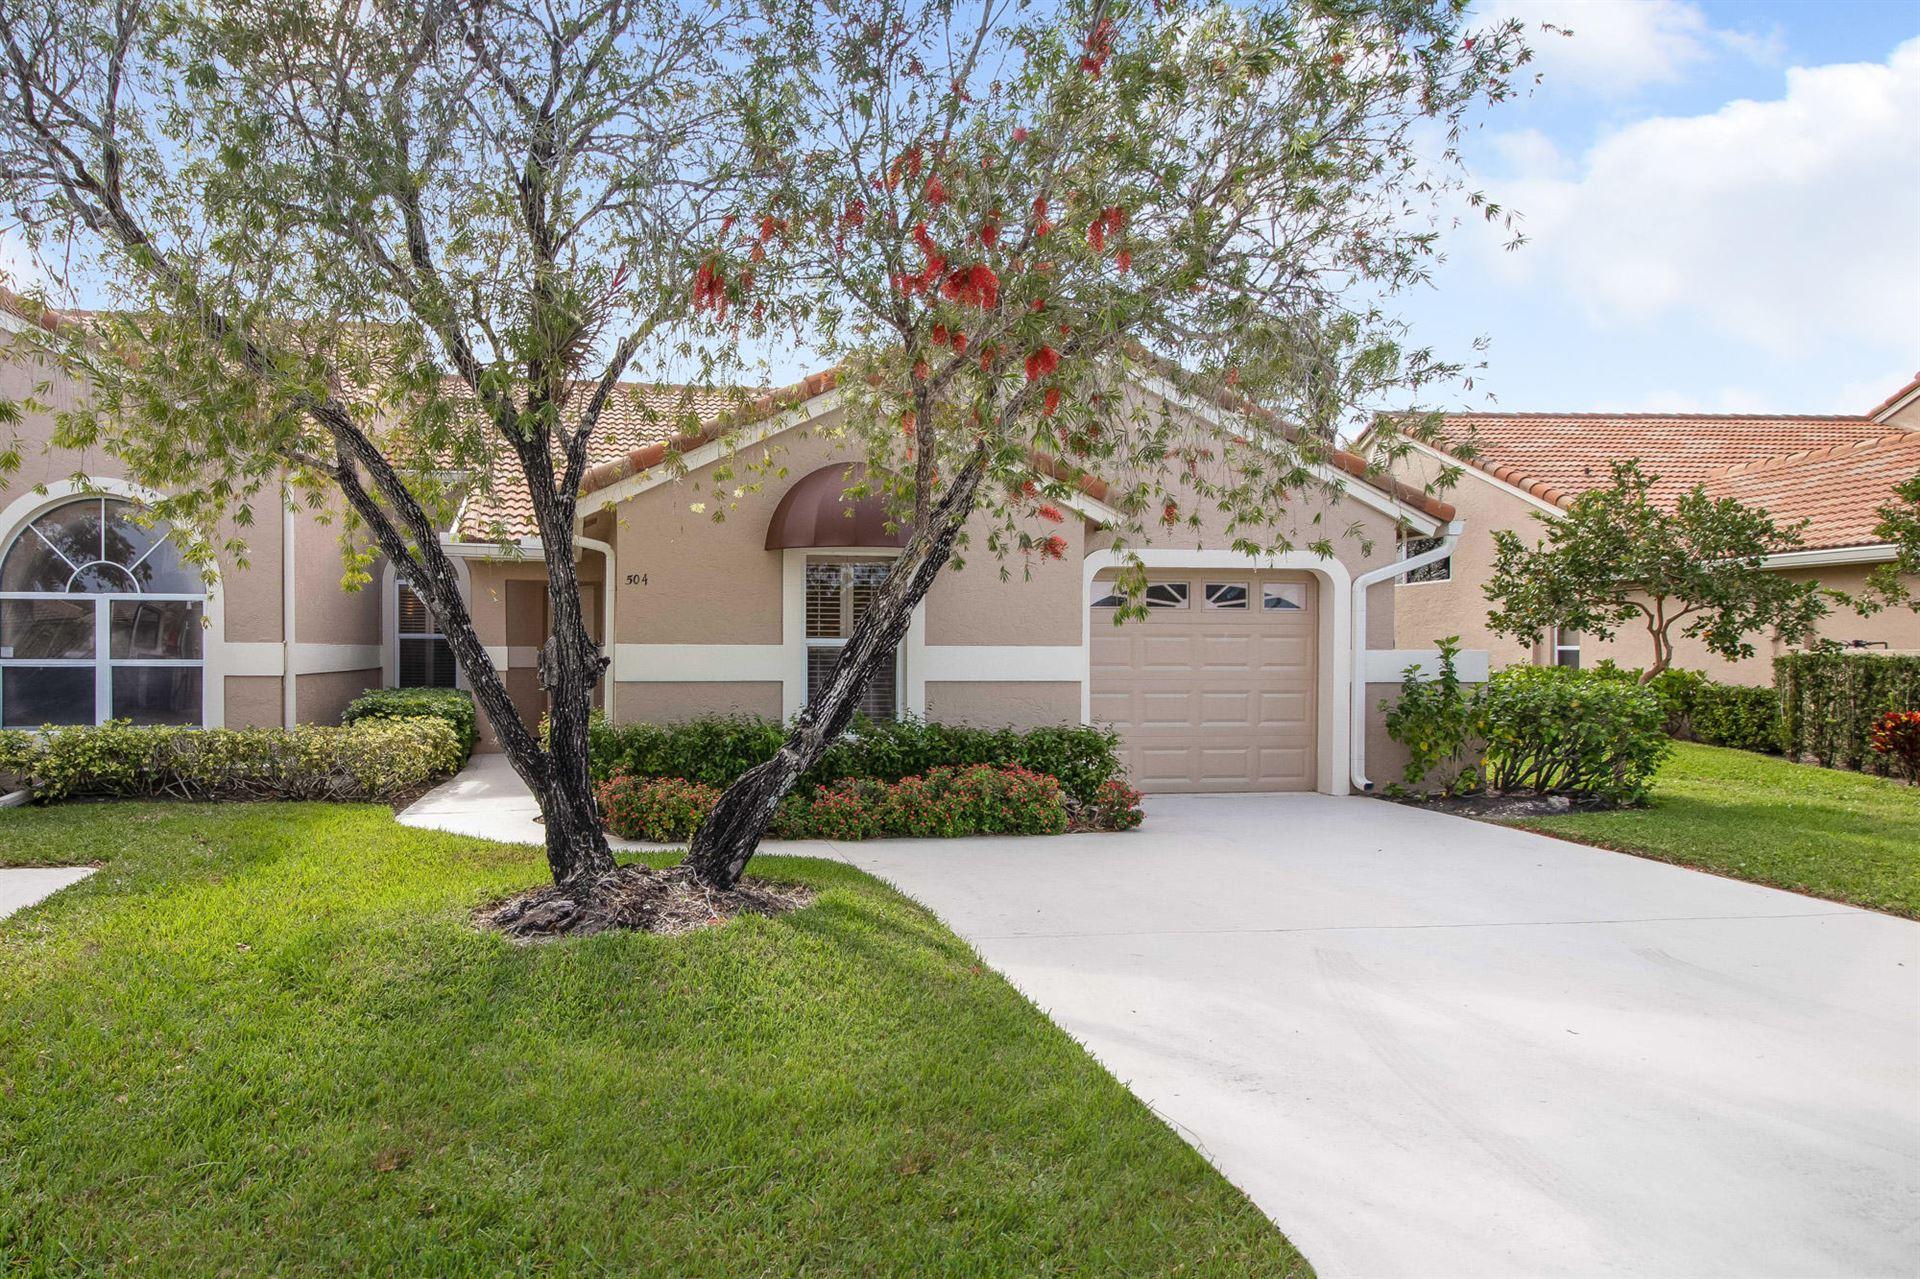 Photo of 504 Sabal Palm Lane, Palm Beach Gardens, FL 33418 (MLS # RX-10607098)